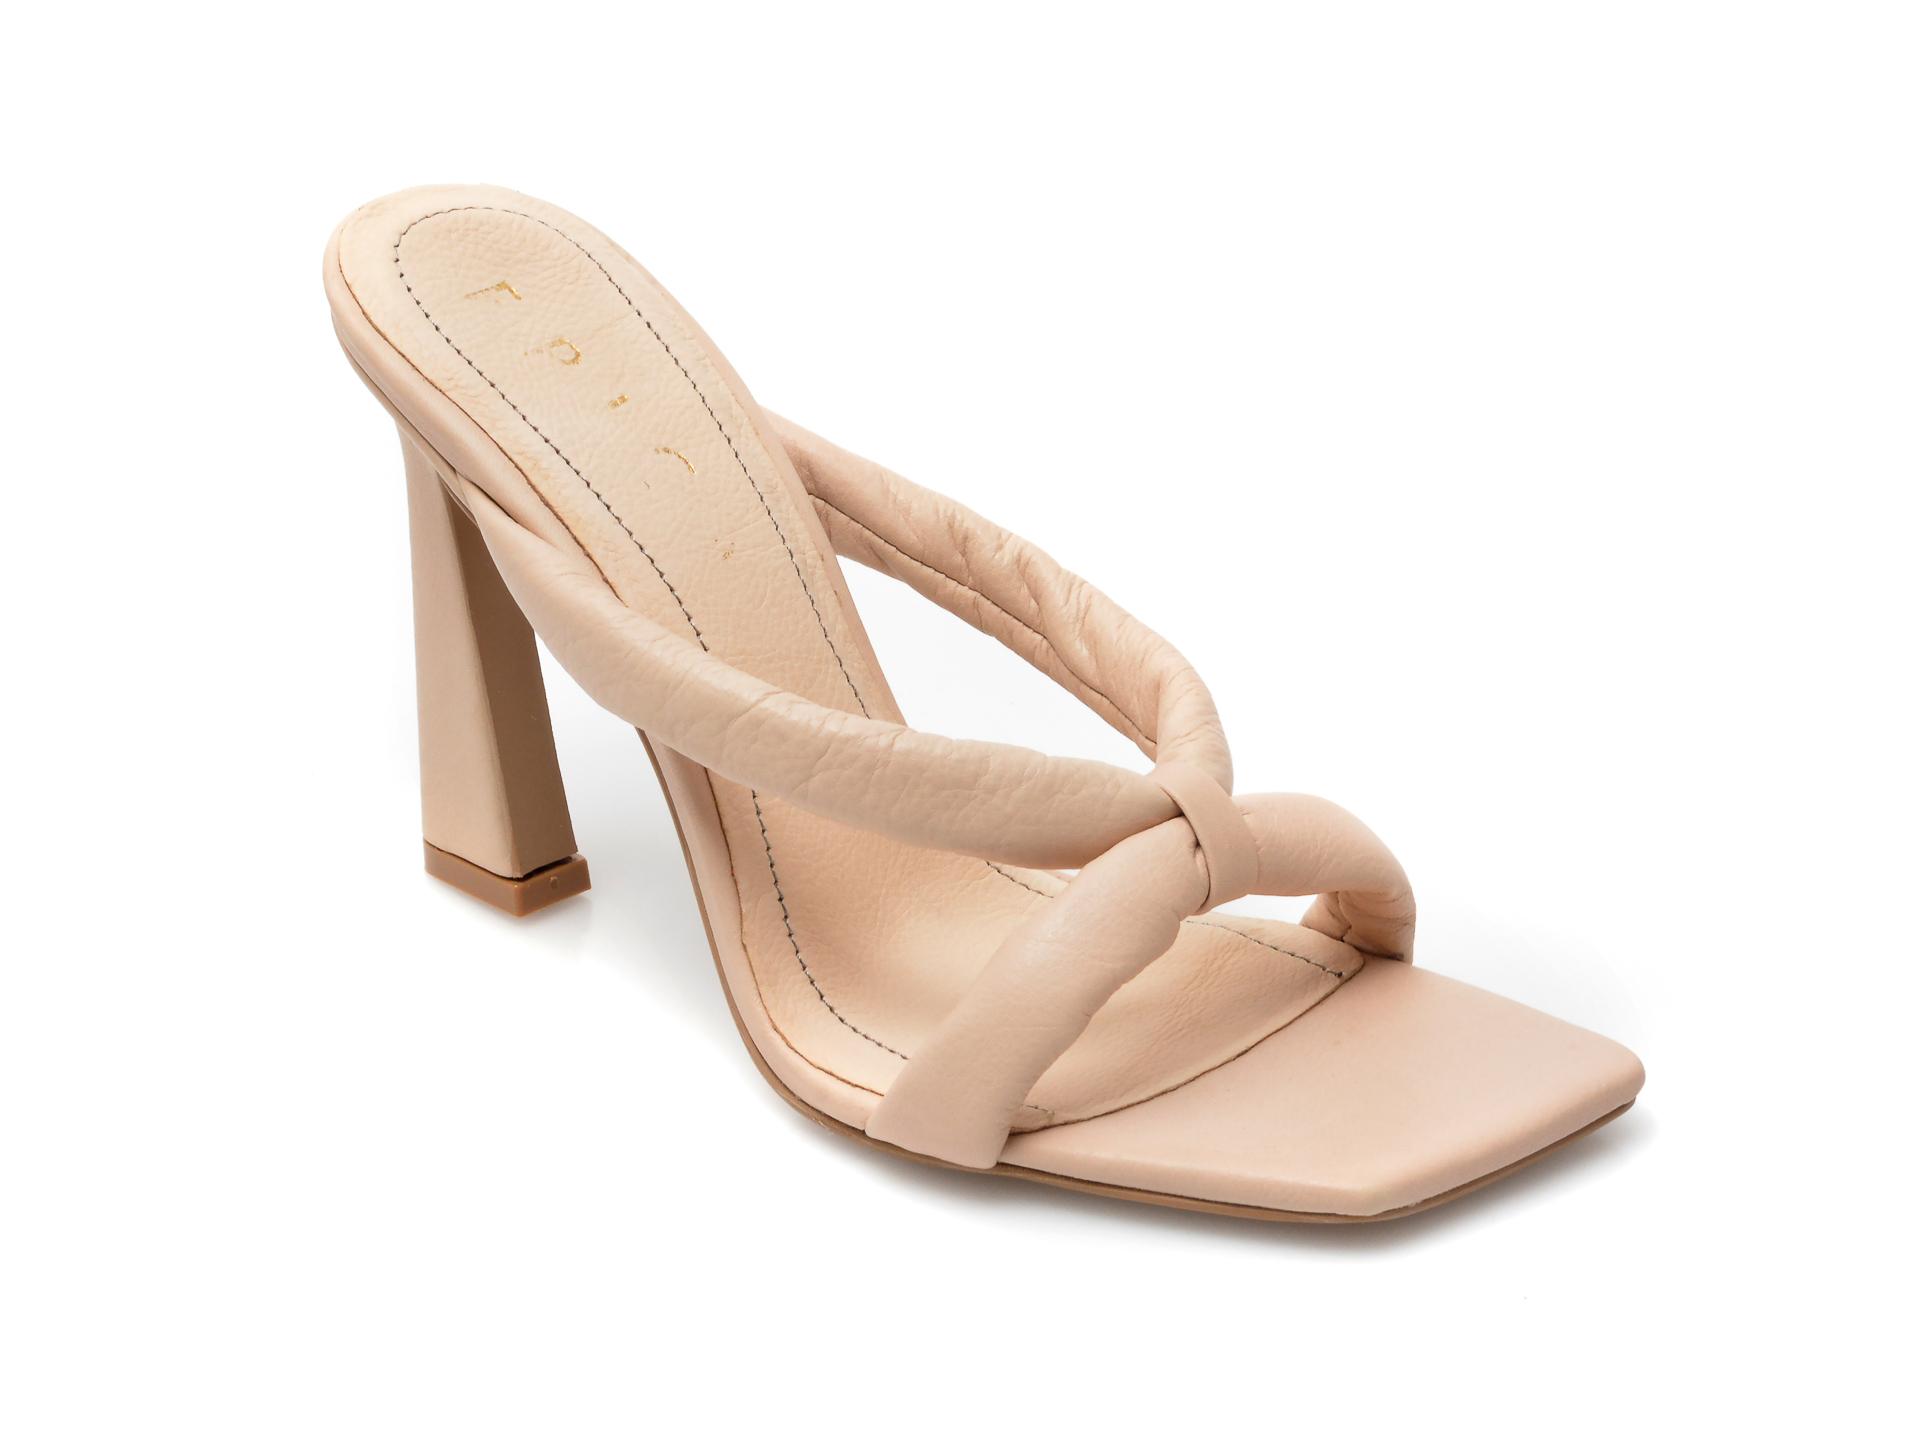 Papuci EPICA bej, 4142, din piele naturala imagine otter.ro 2021